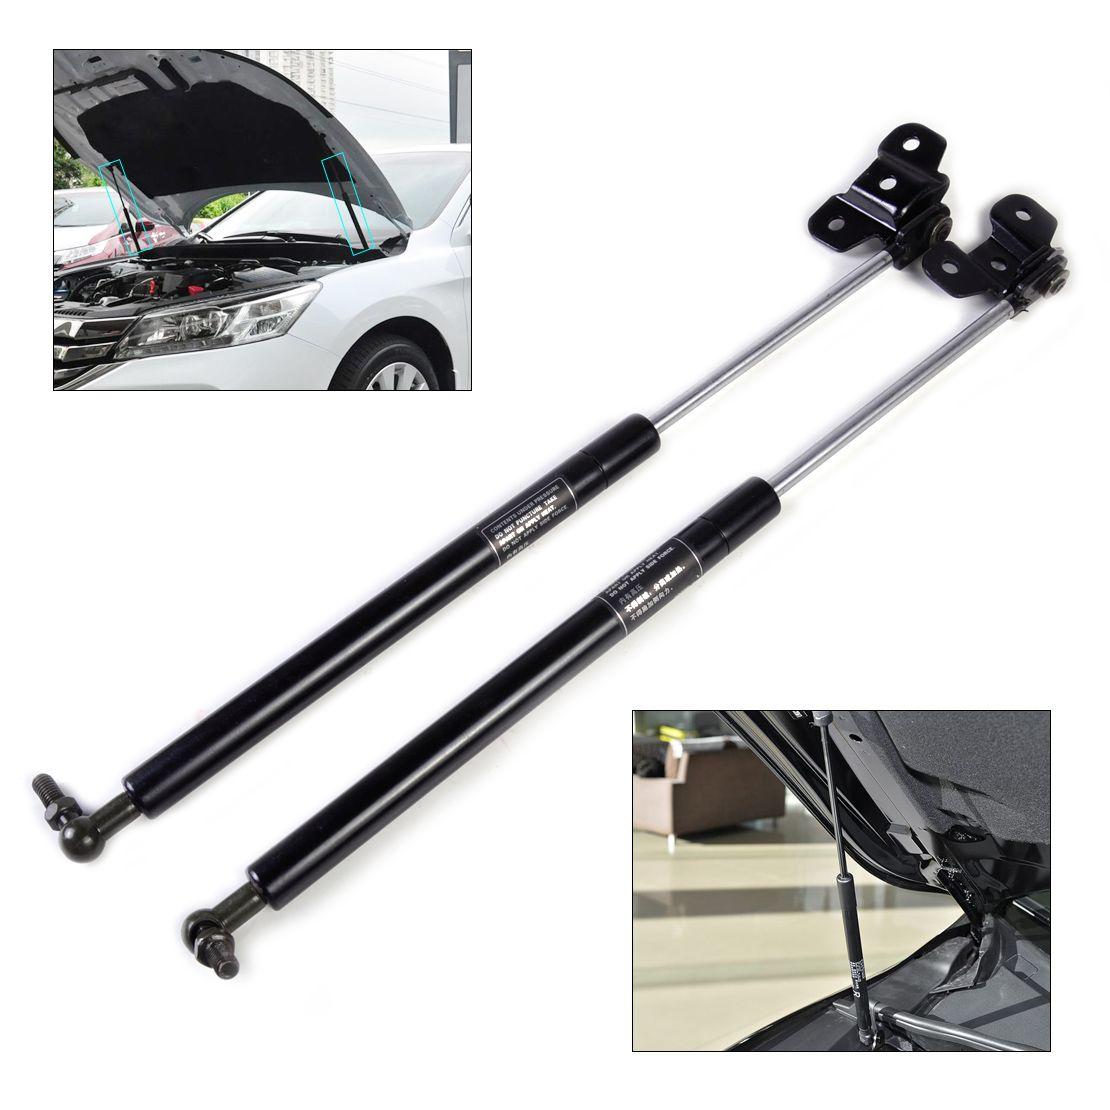 beler 2Pcs Metal Auto Front Hood Lid Lift Support Damper Shock Strut Fit for Honda Accord 2003 2004 2005 2006 2007 High Quality